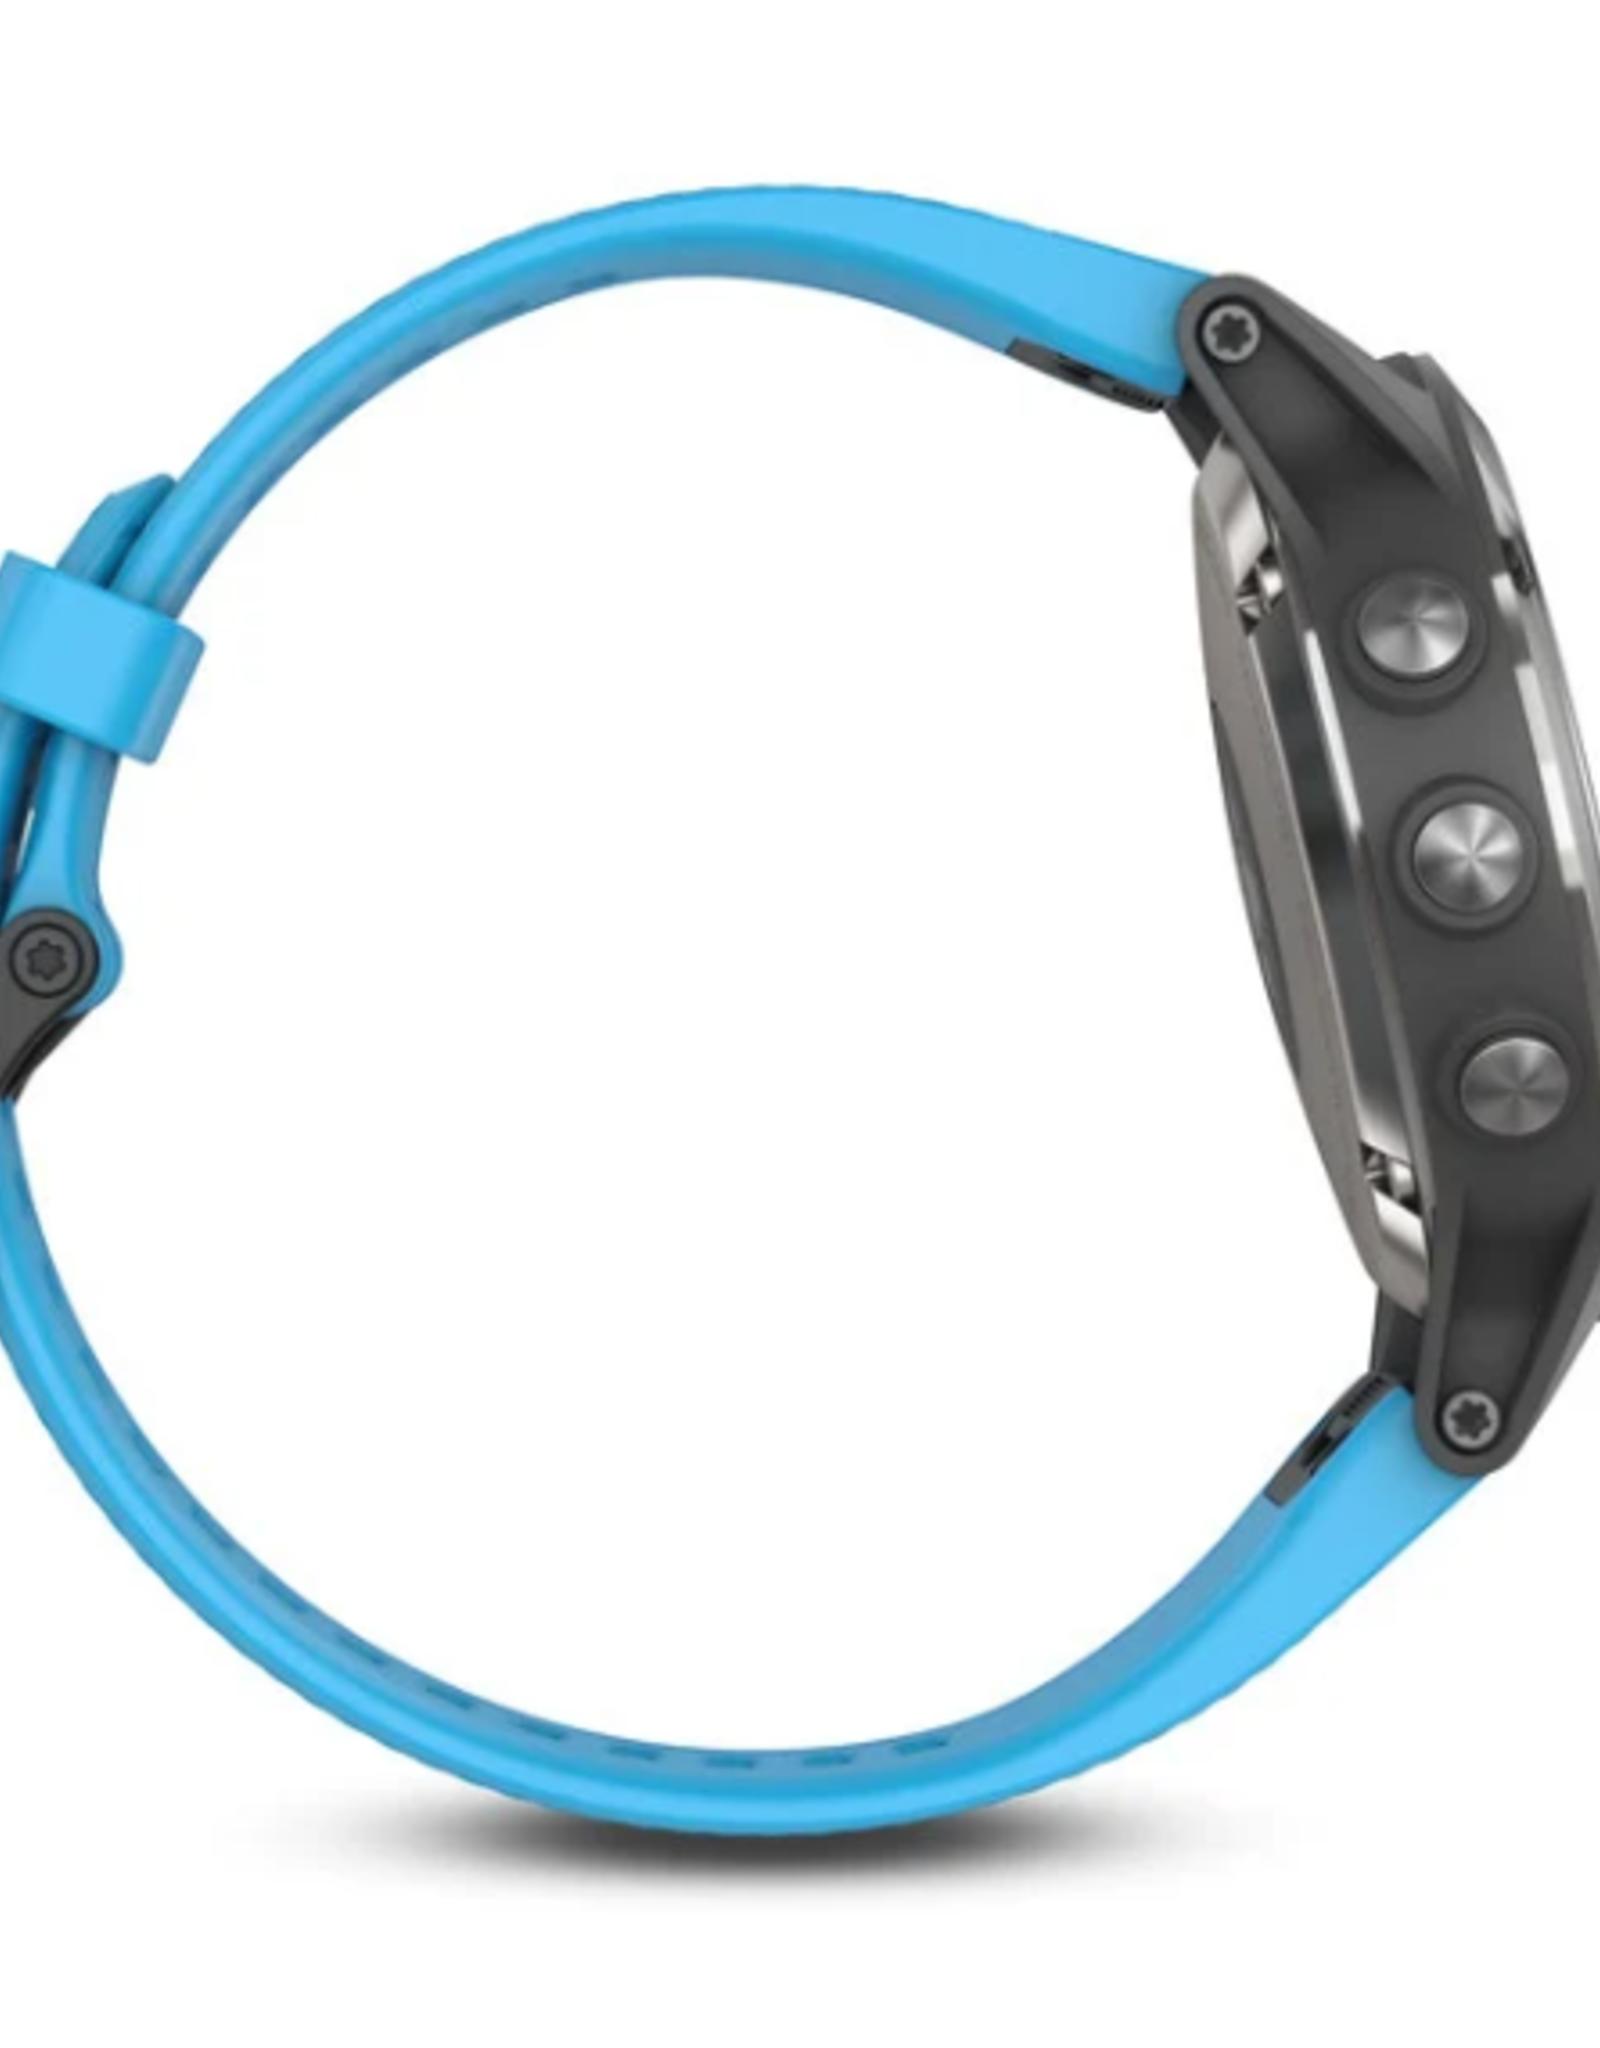 Garmin 010-01688-40 Quaitx 5 Stainless Steel with Blue Band